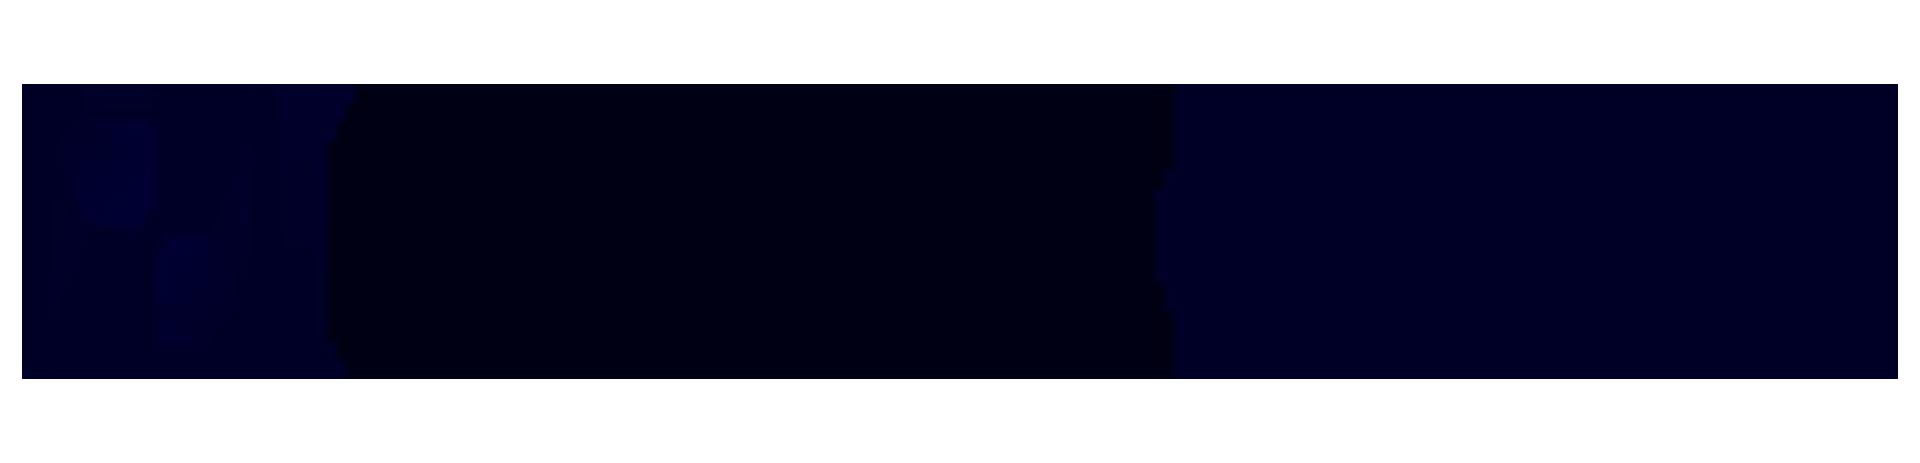 linfinity